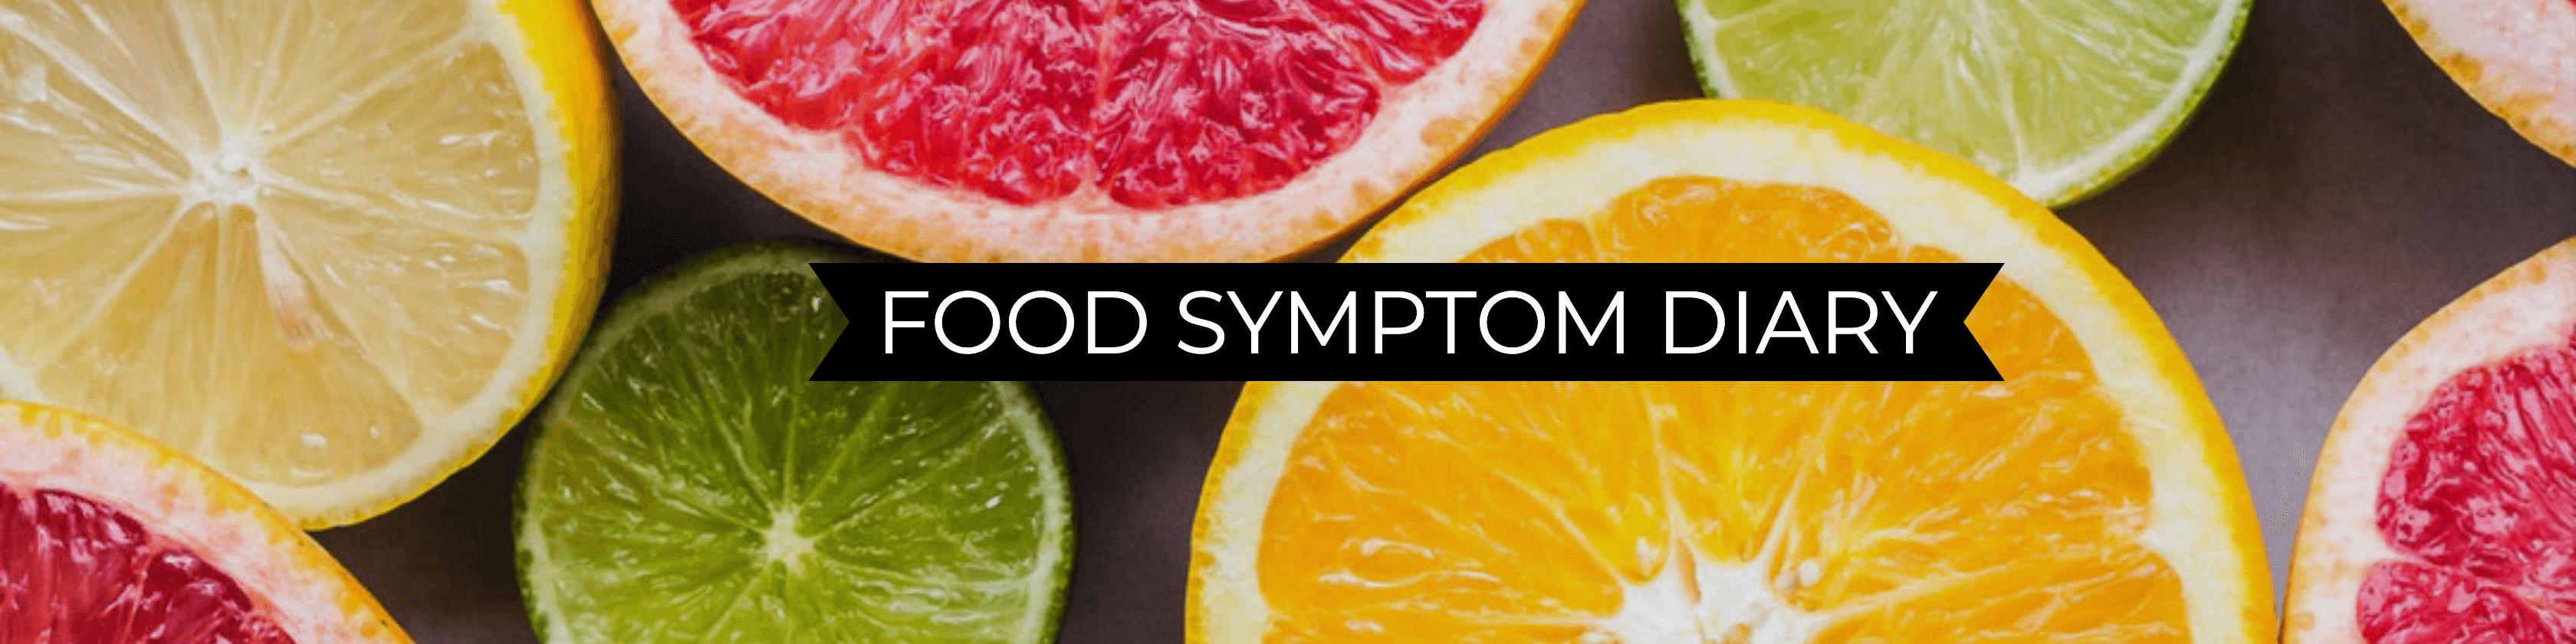 food symptom diary